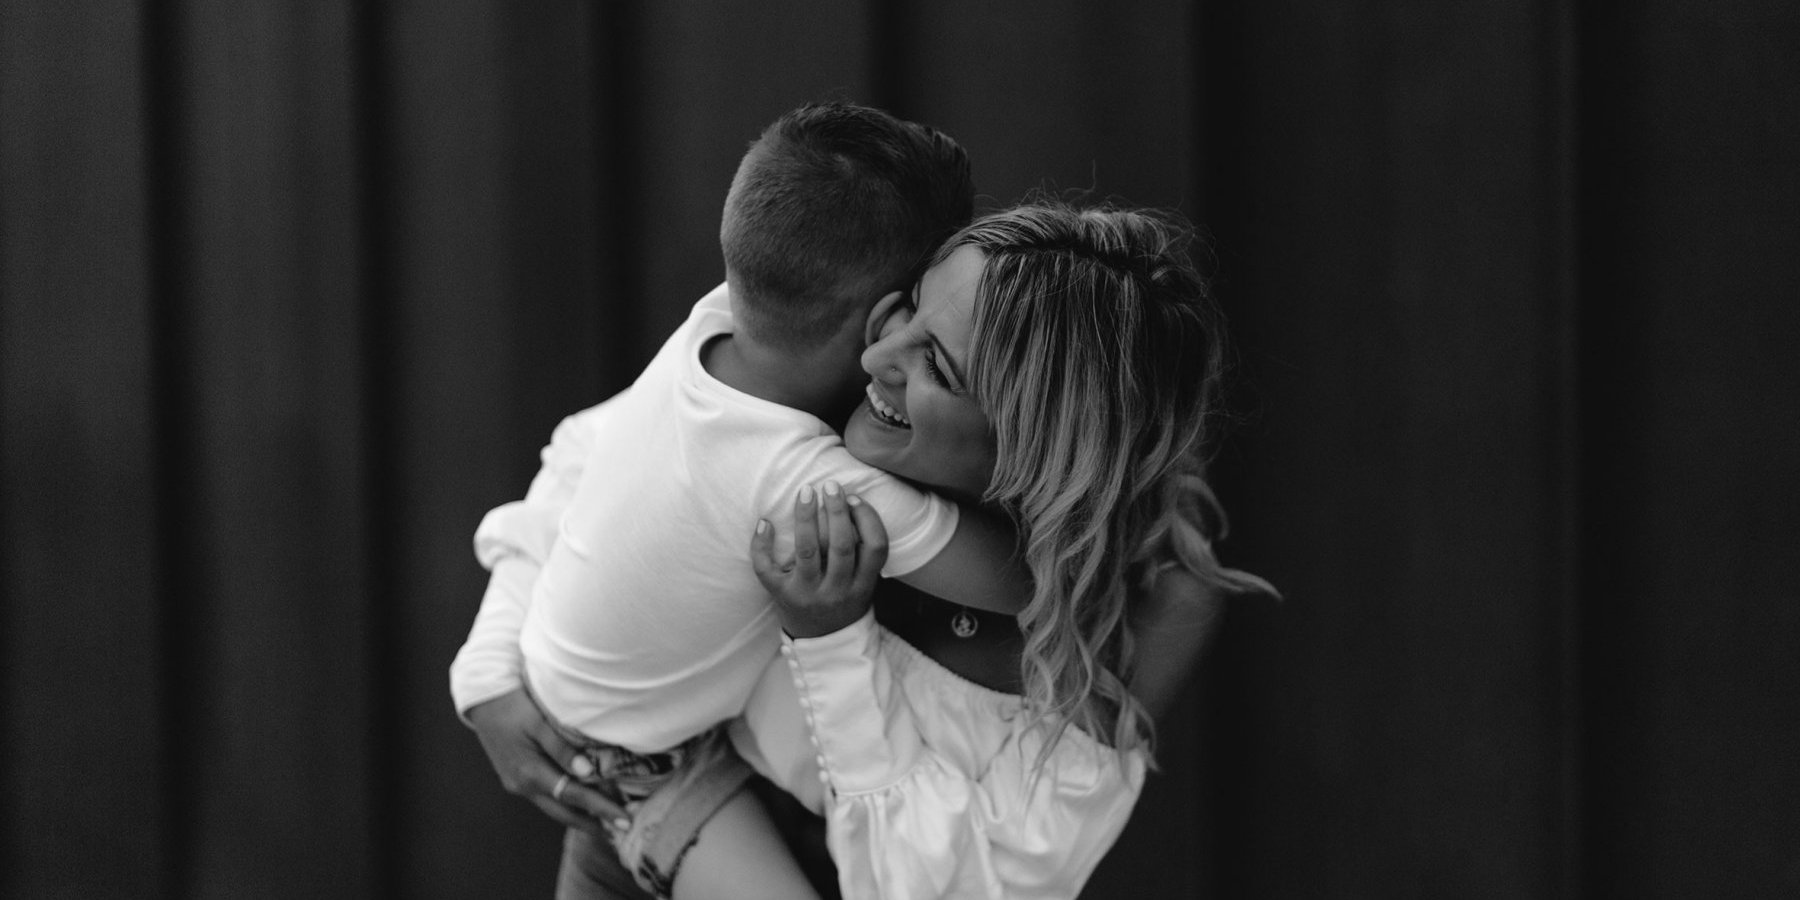 Wild-Romantic-Photography-Family-Portraits-Melbourne-10